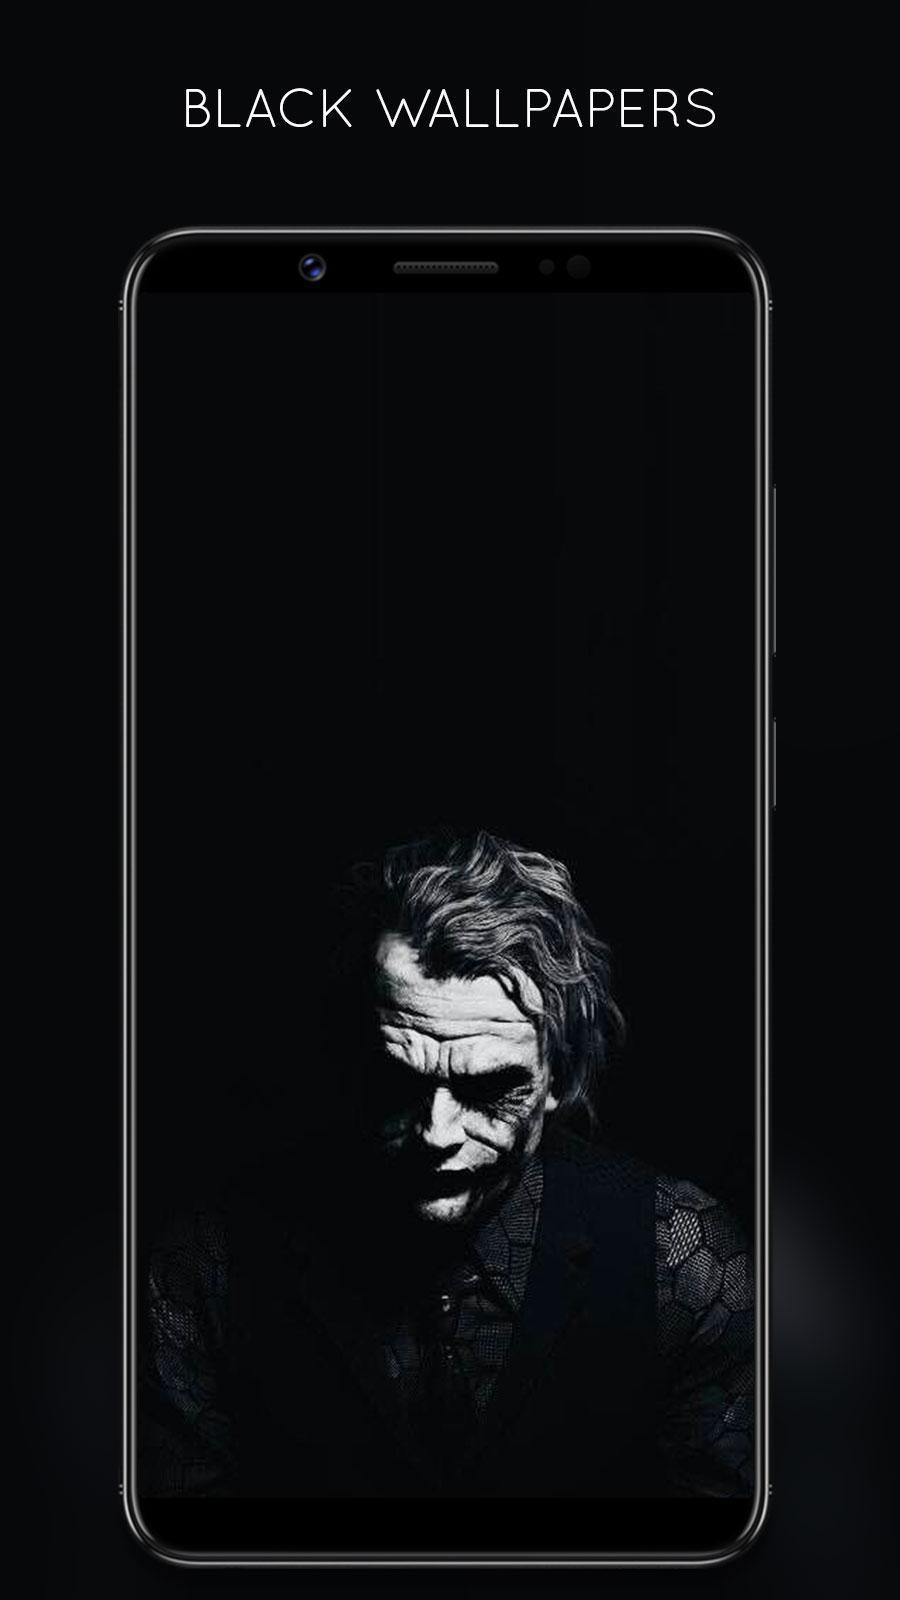 Black Wallpaper Hd I 4k Background For Android Apk Download